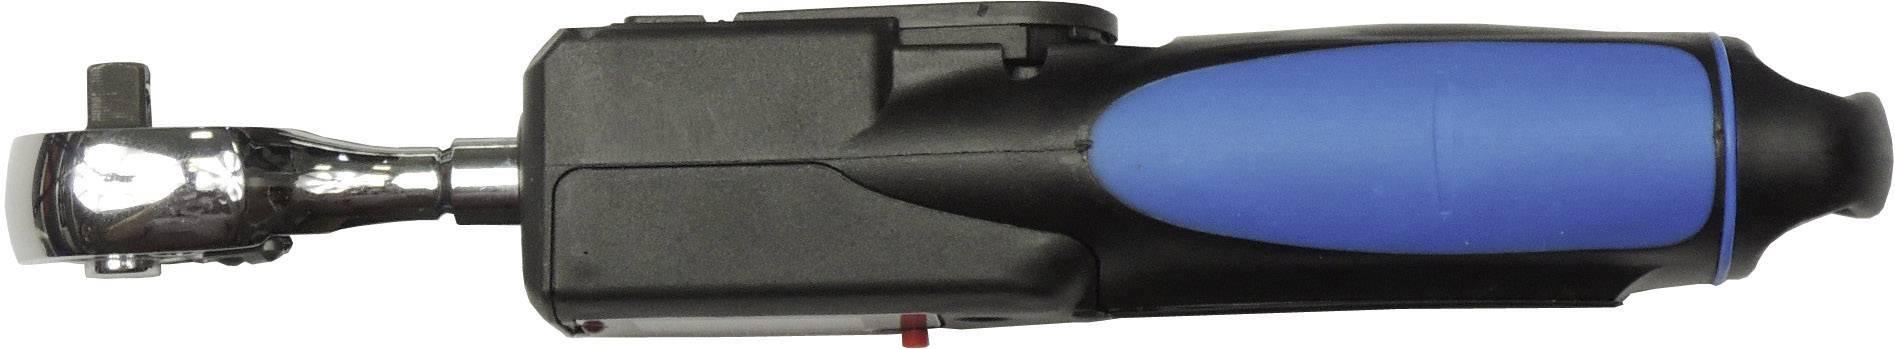 "Momentový kľúč Kunzer Drehmomentknarre 1/4"" (6-30 NM) 7DMK14, 1/4"" (6,3 mm), 6 - 30 Nm"